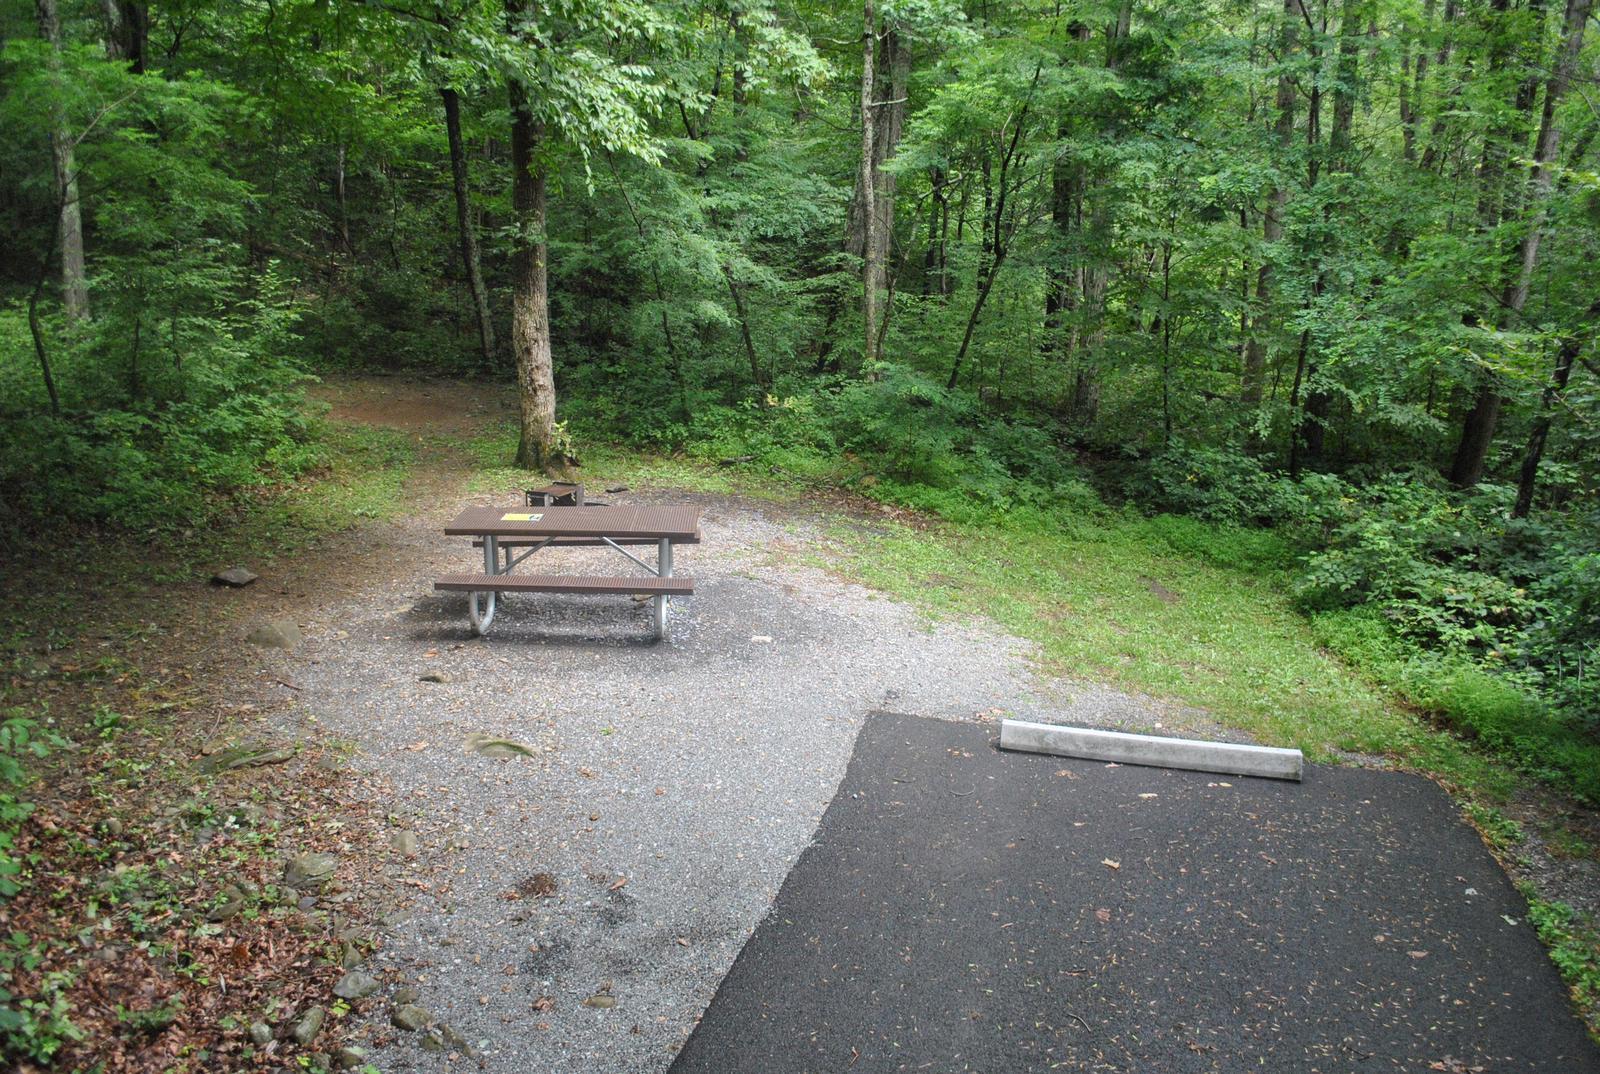 Mathews Arm Campground - Site A001